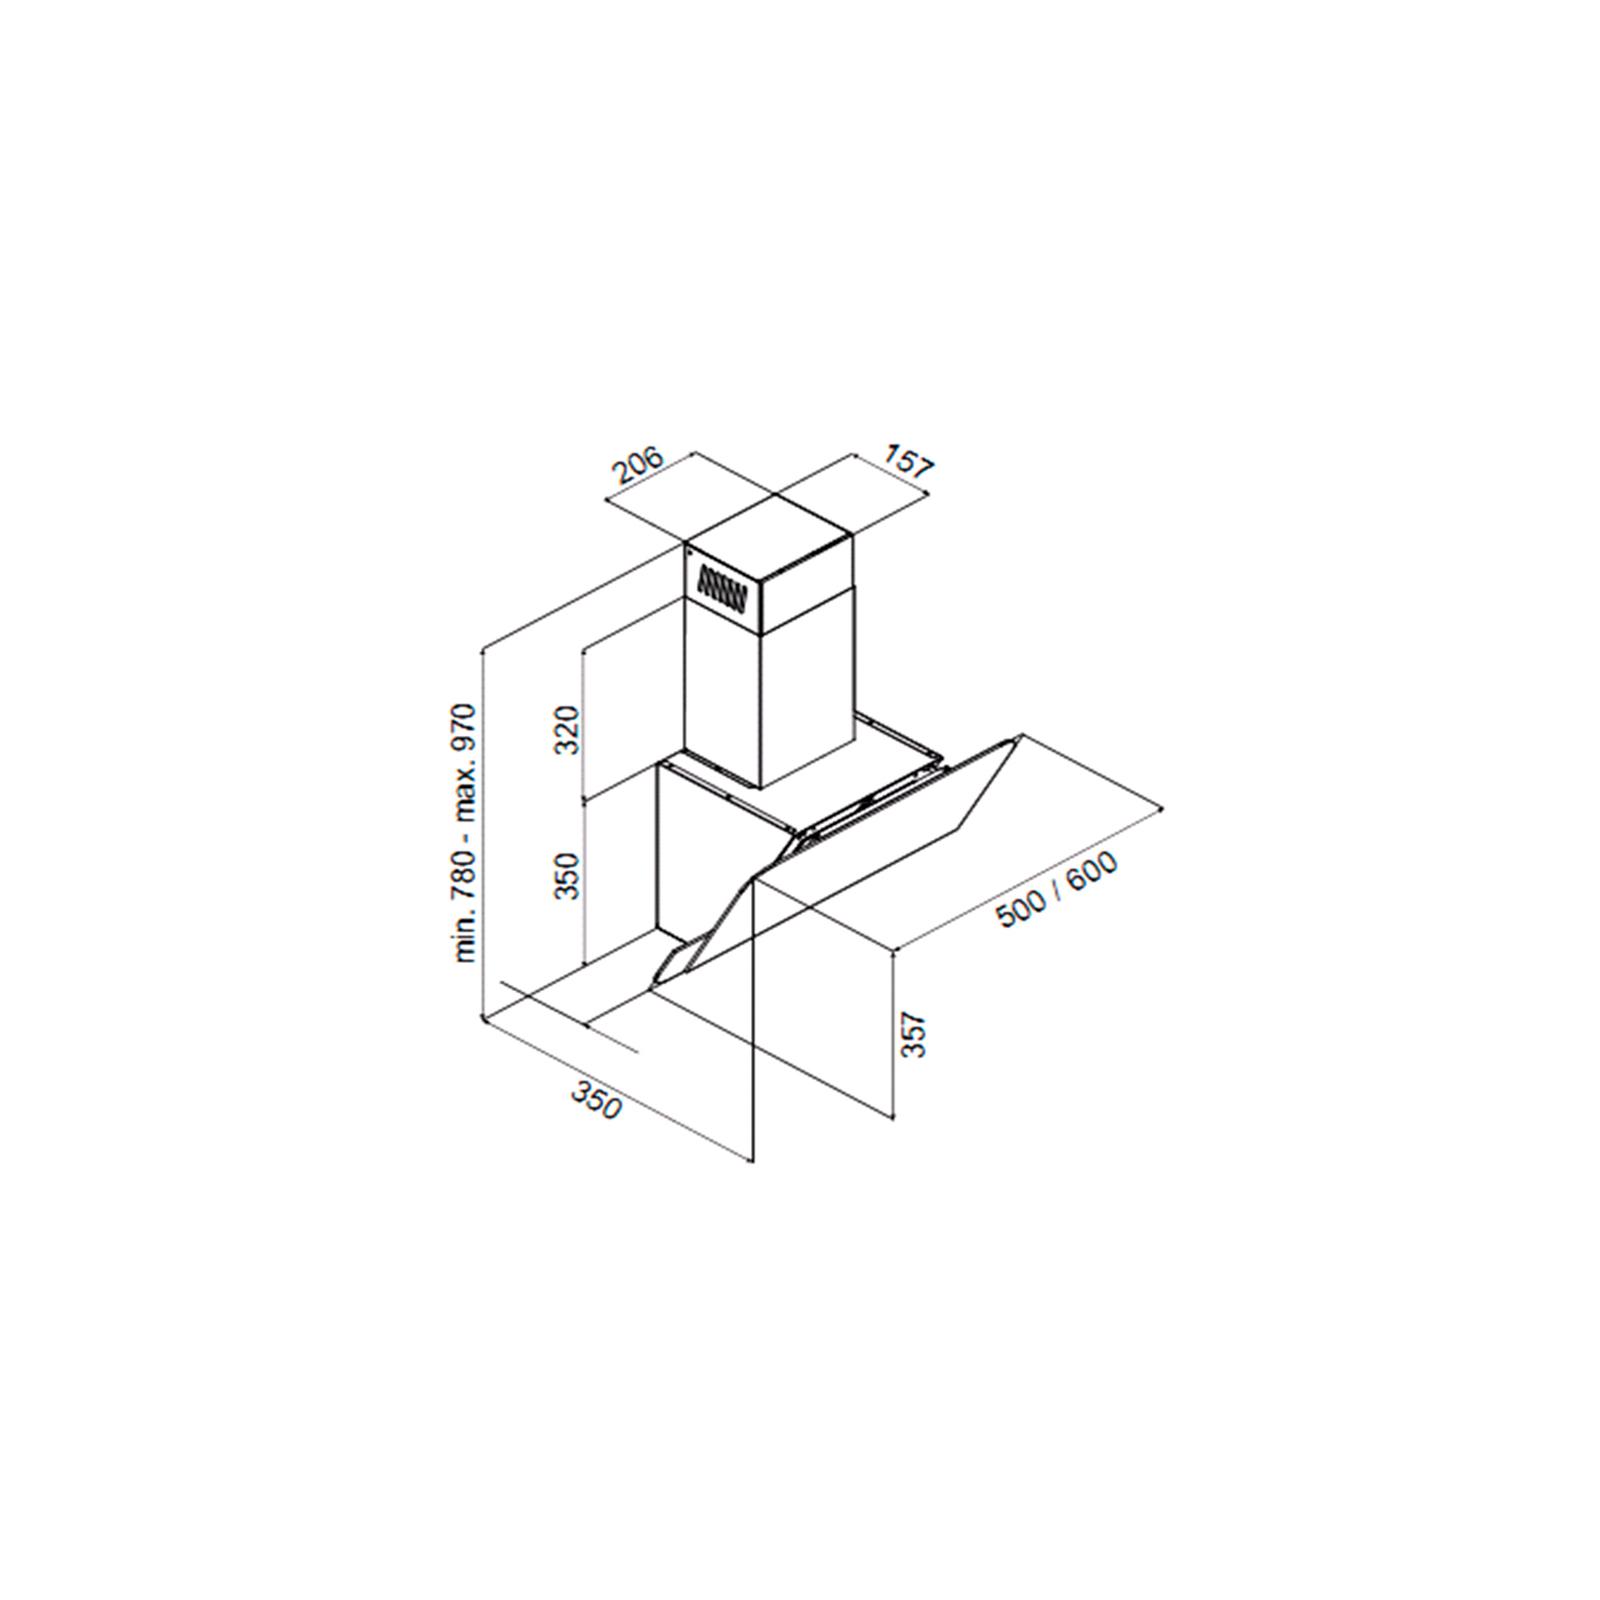 Вытяжка кухонная PERFELLI DNS 6114 BL LED изображение 7